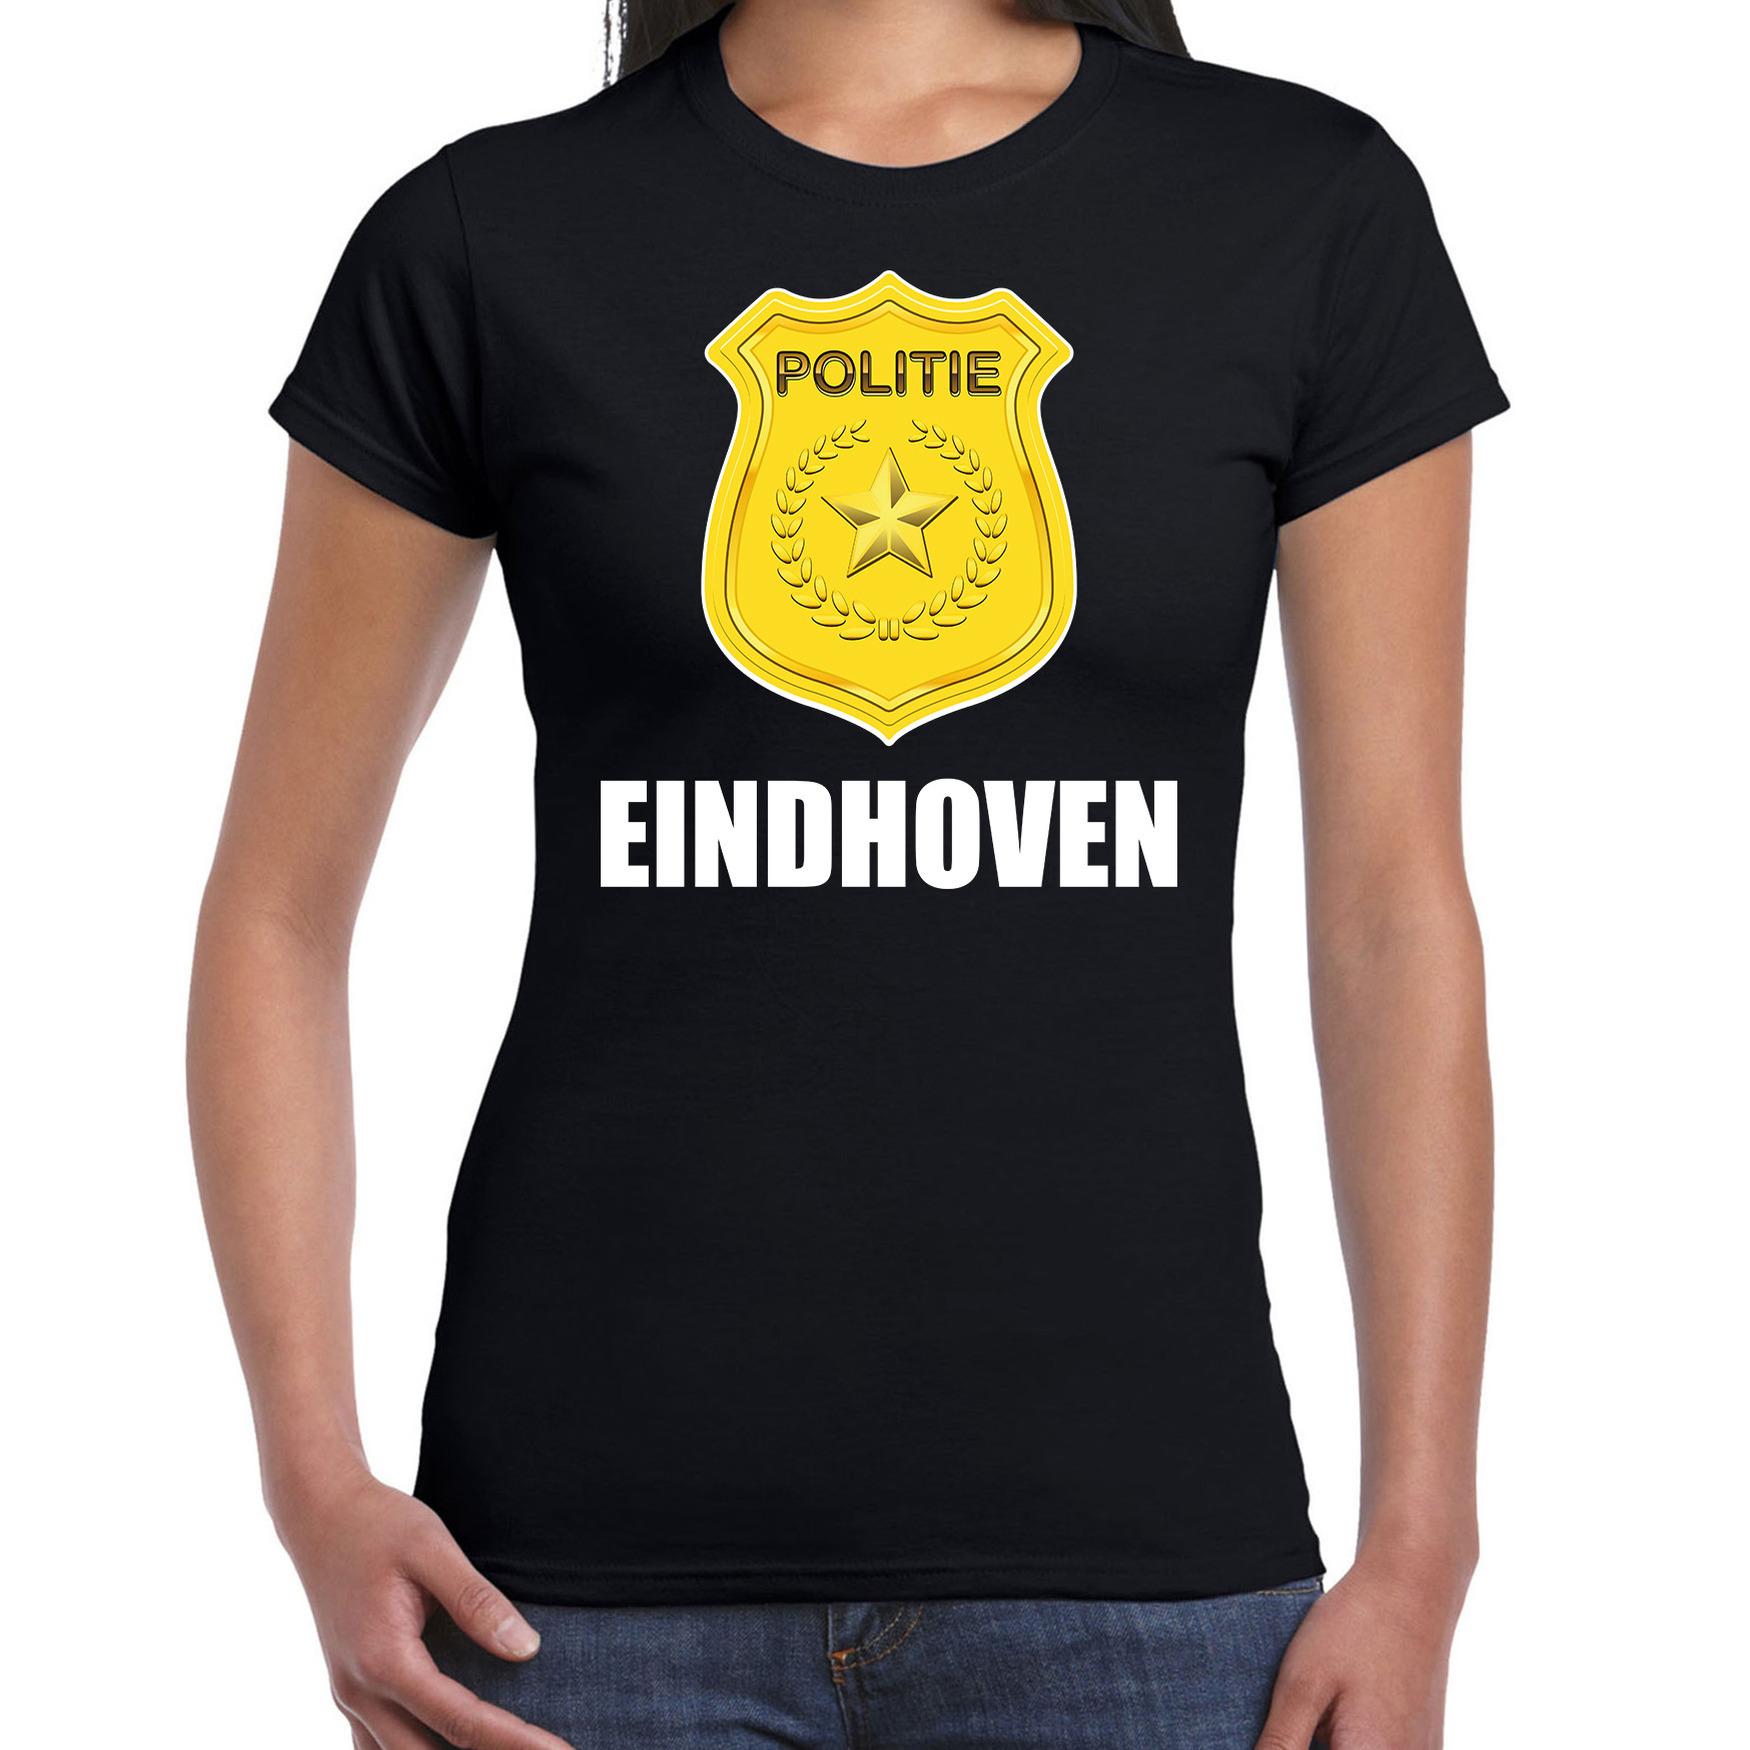 Carnaval shirt-outfit Eindhoven politie embleem zwart voor dames